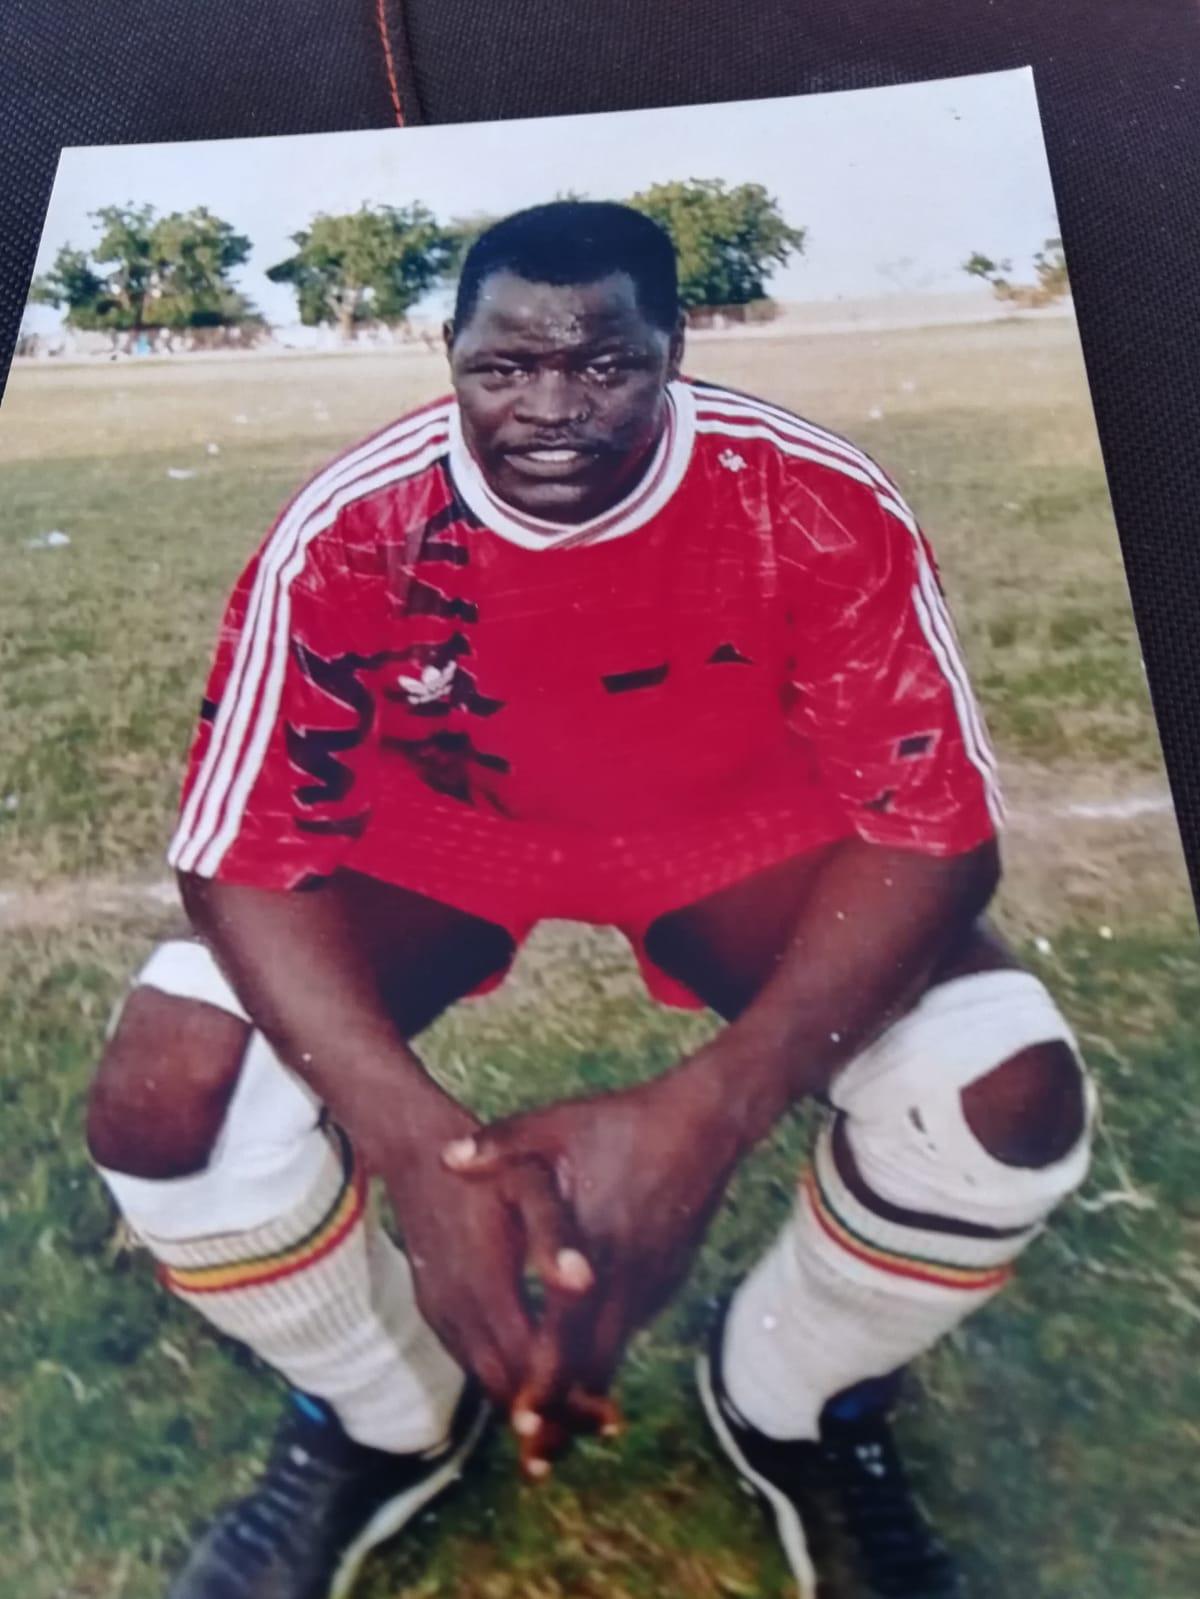 Nécrologie : Décès de Doudou Ndiaye ancien joueur du Ndiambour.